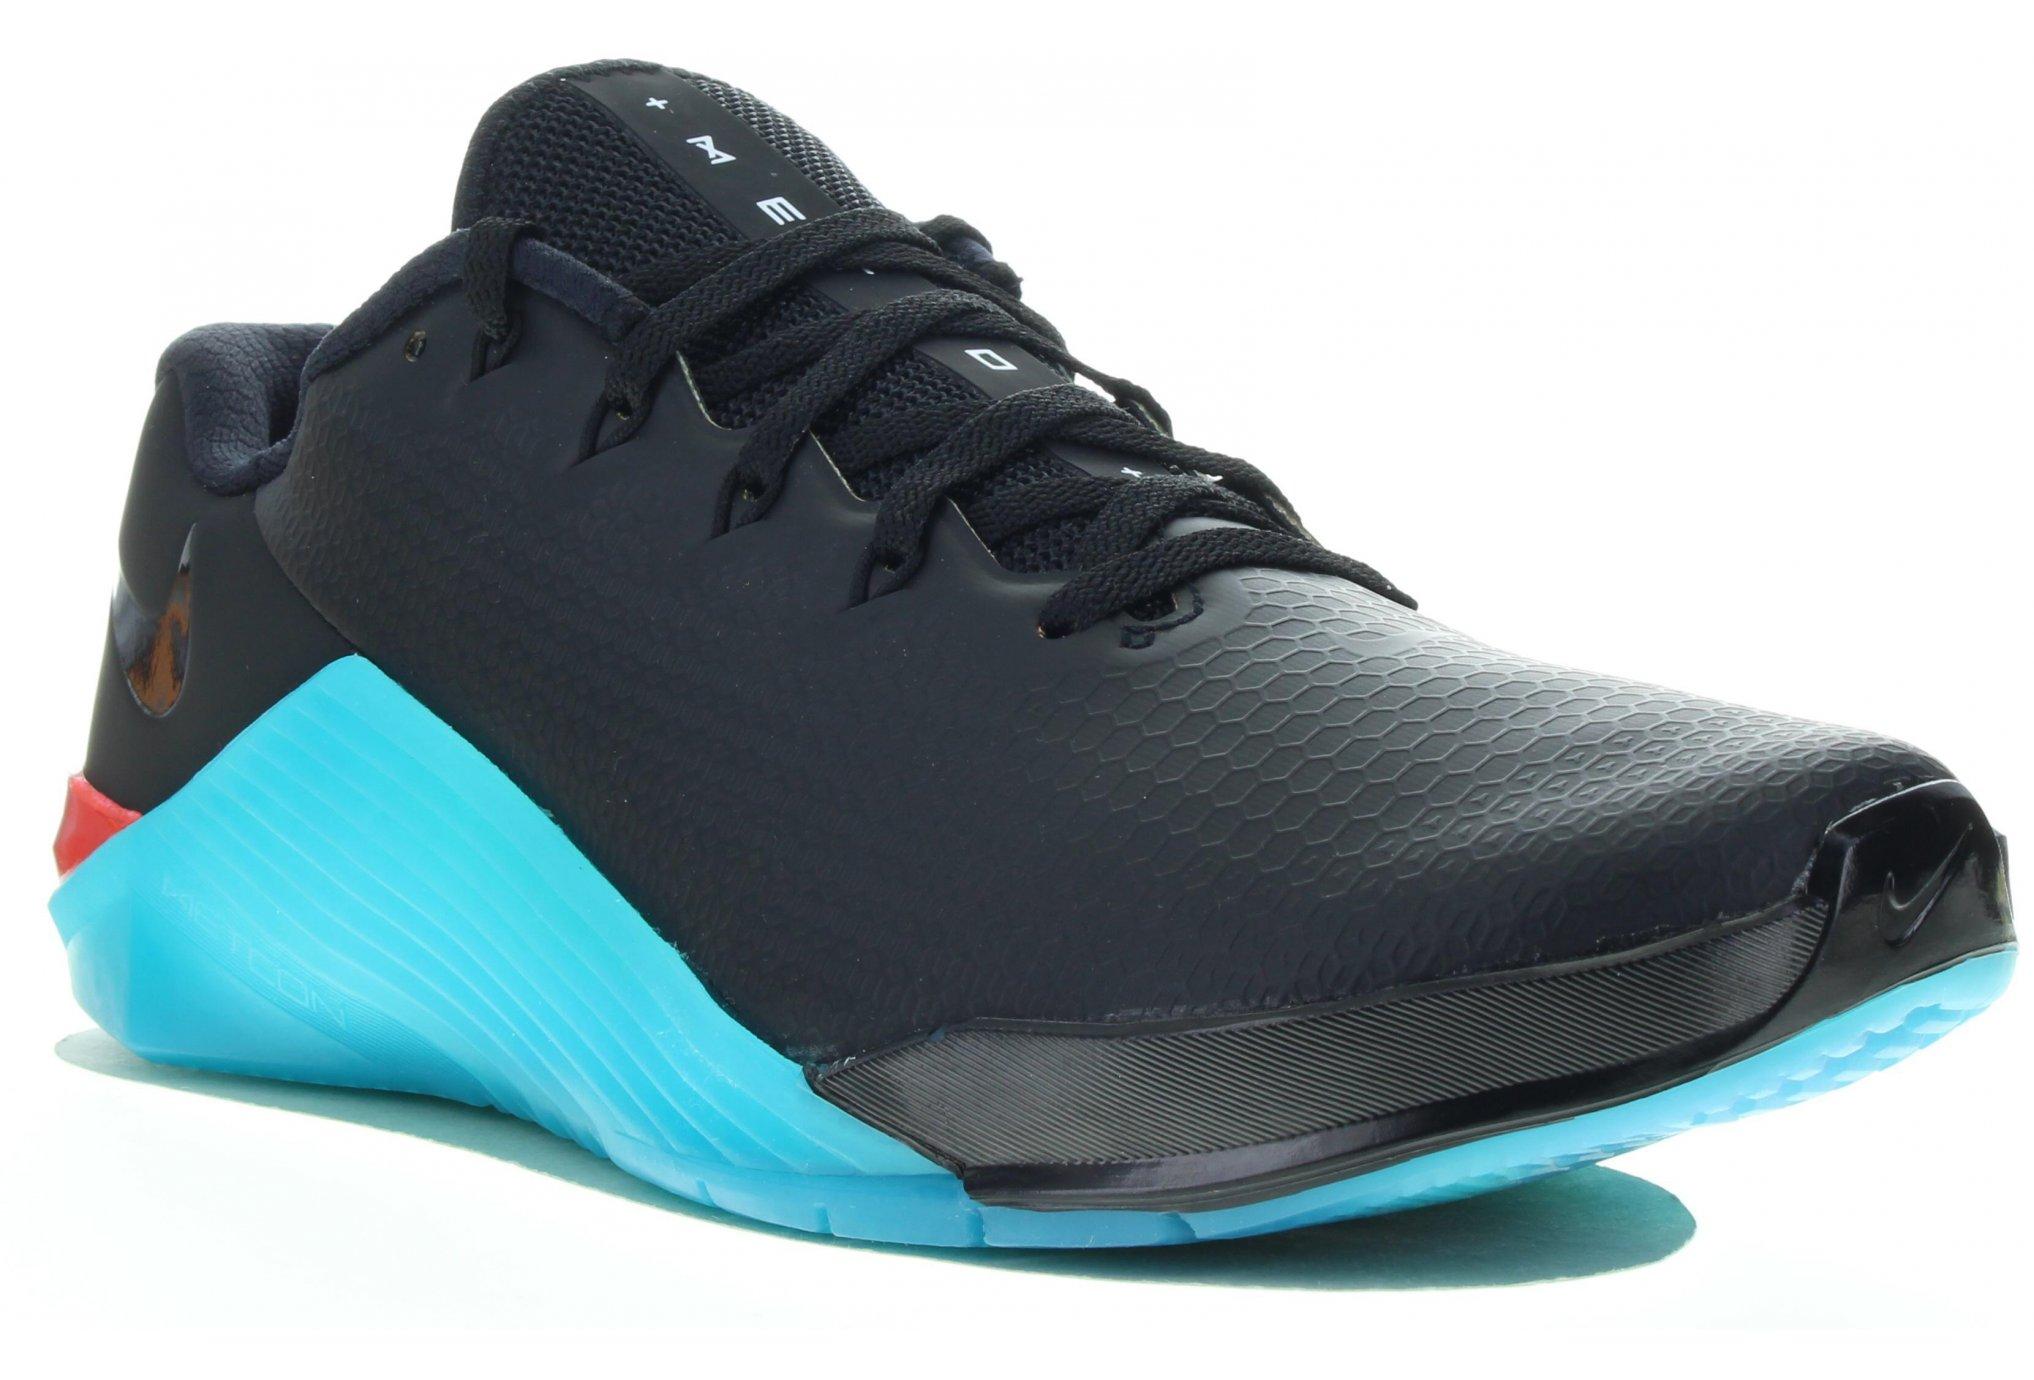 Nike Metcon 5 AMP